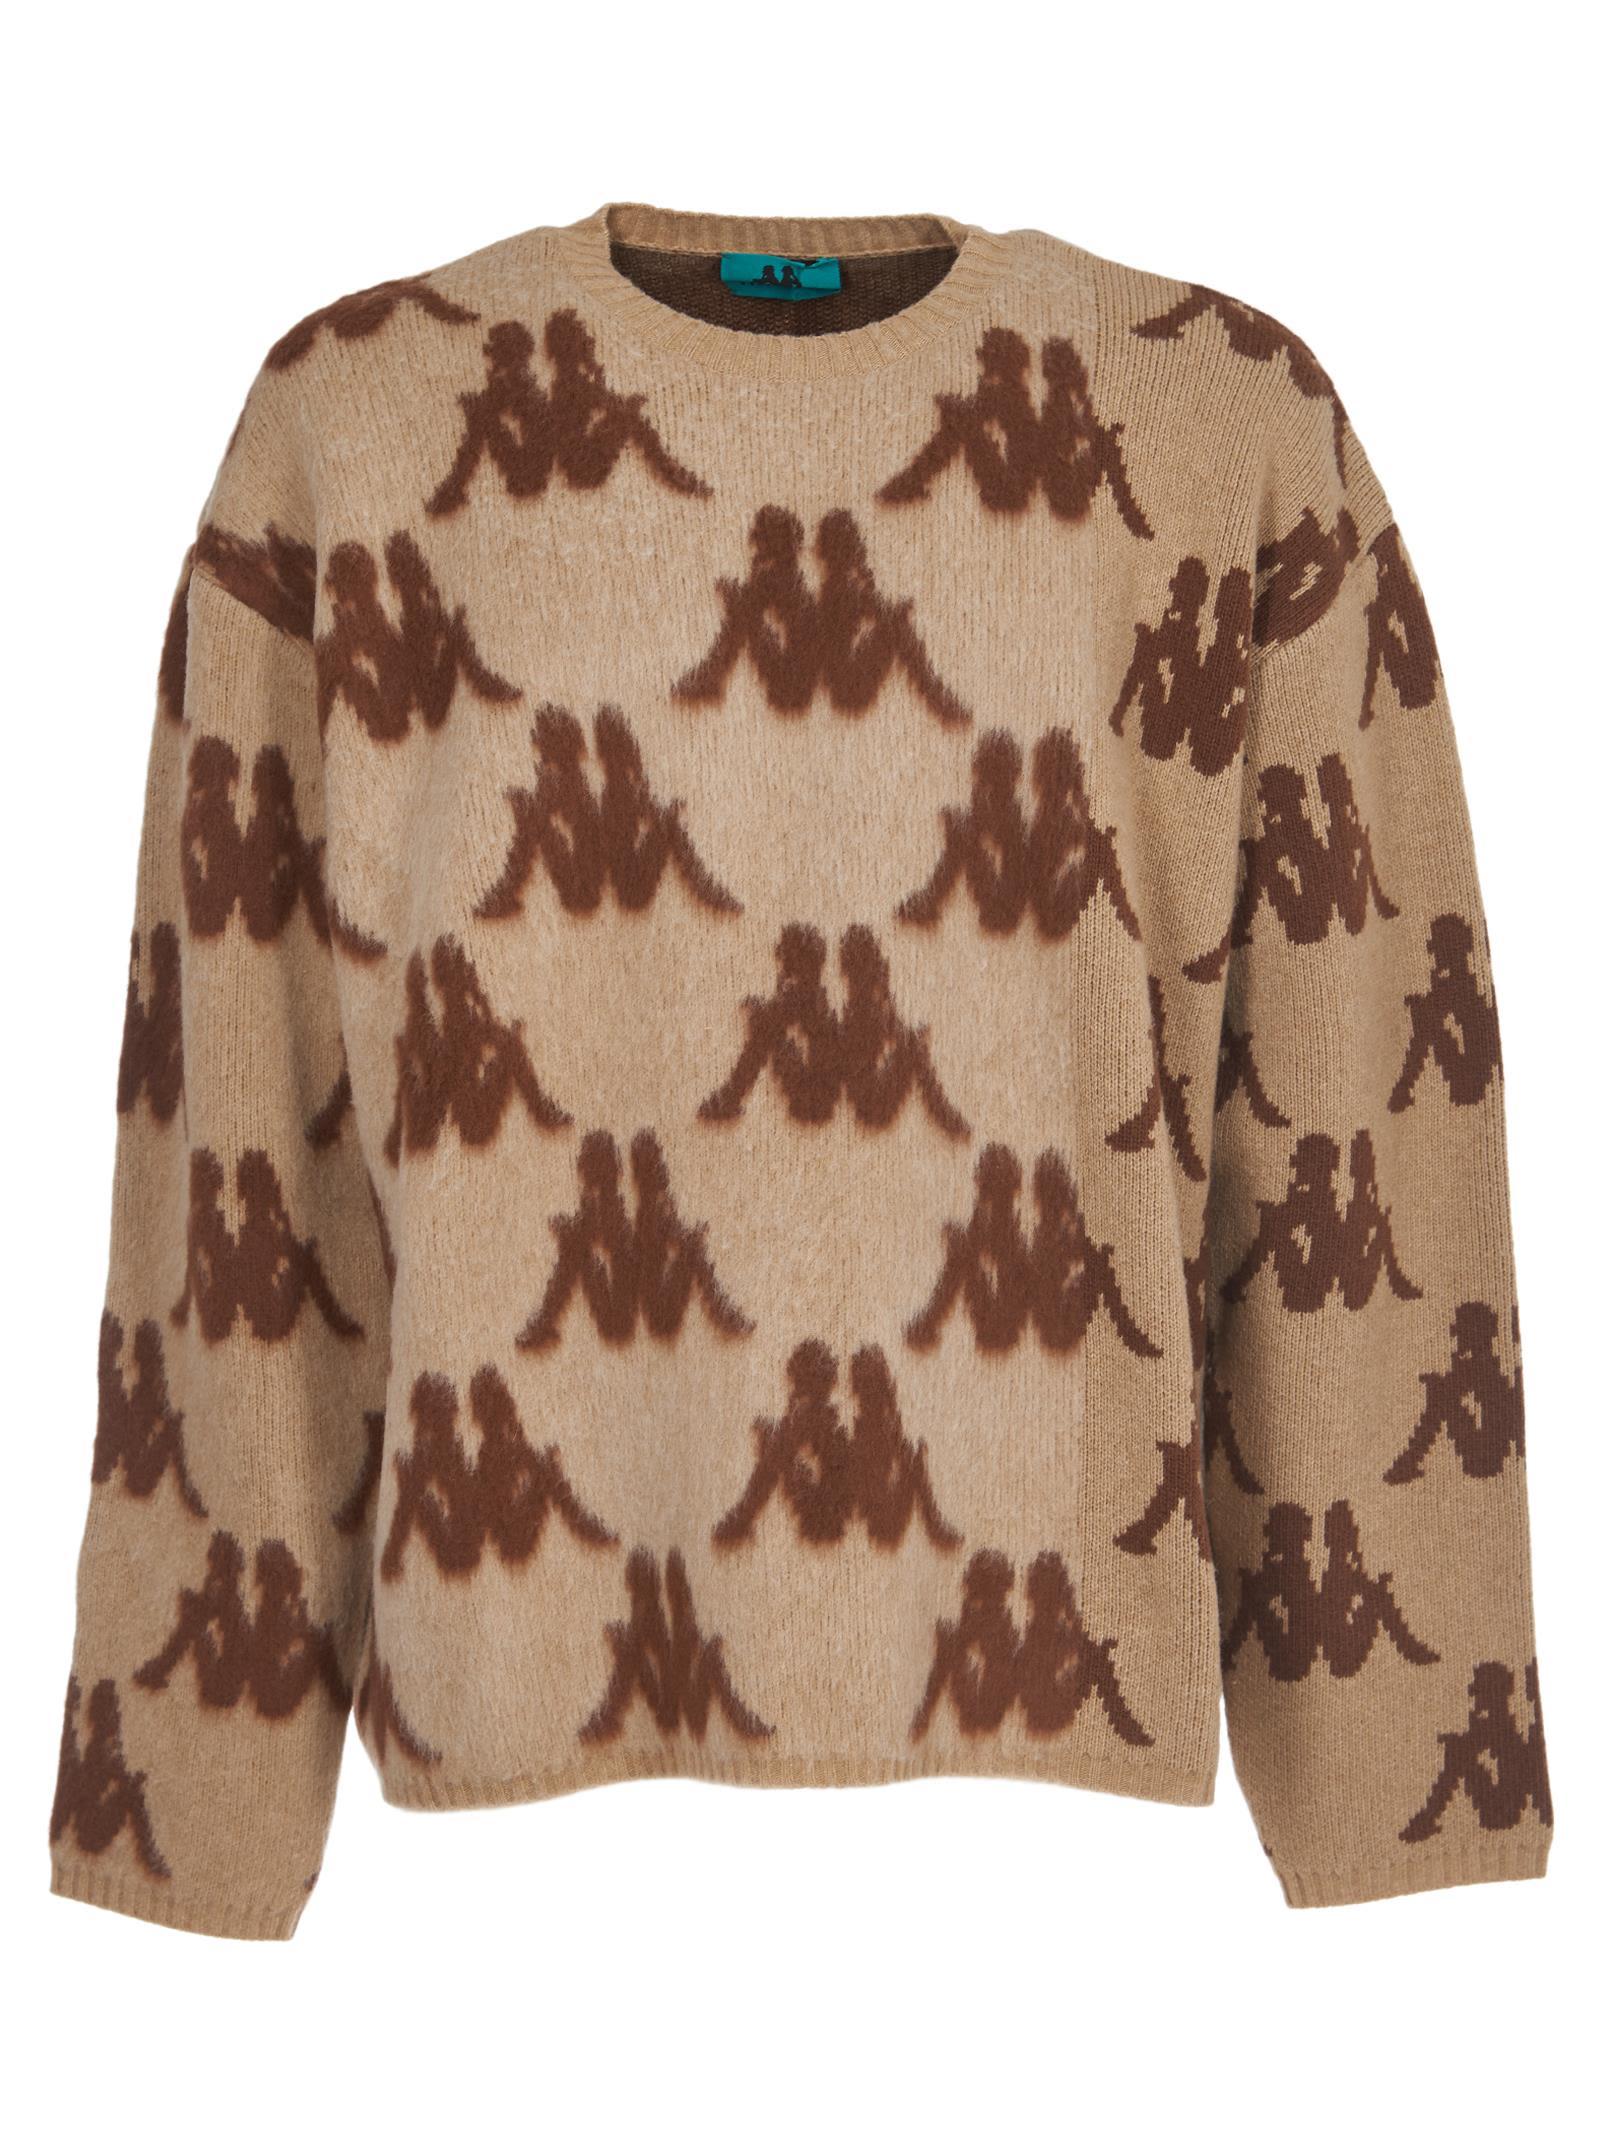 DANILO PAURA All Over Logo Sweater in Beige